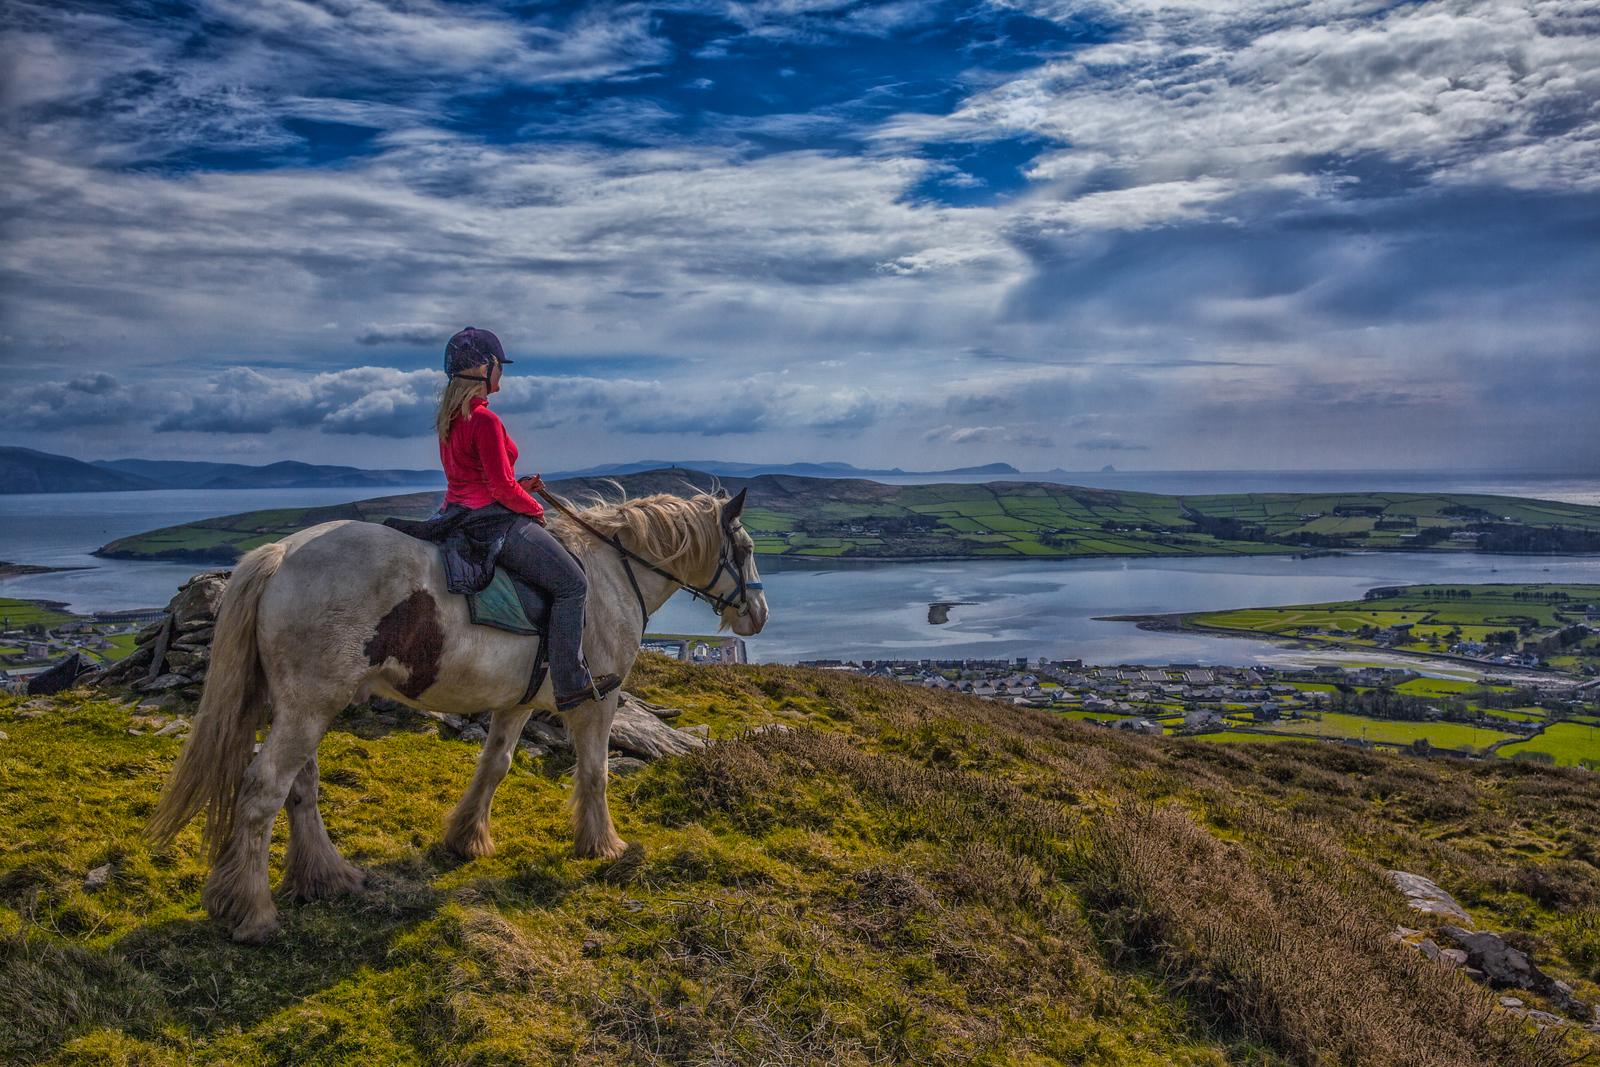 Horseback riding in Dingle, Ireland